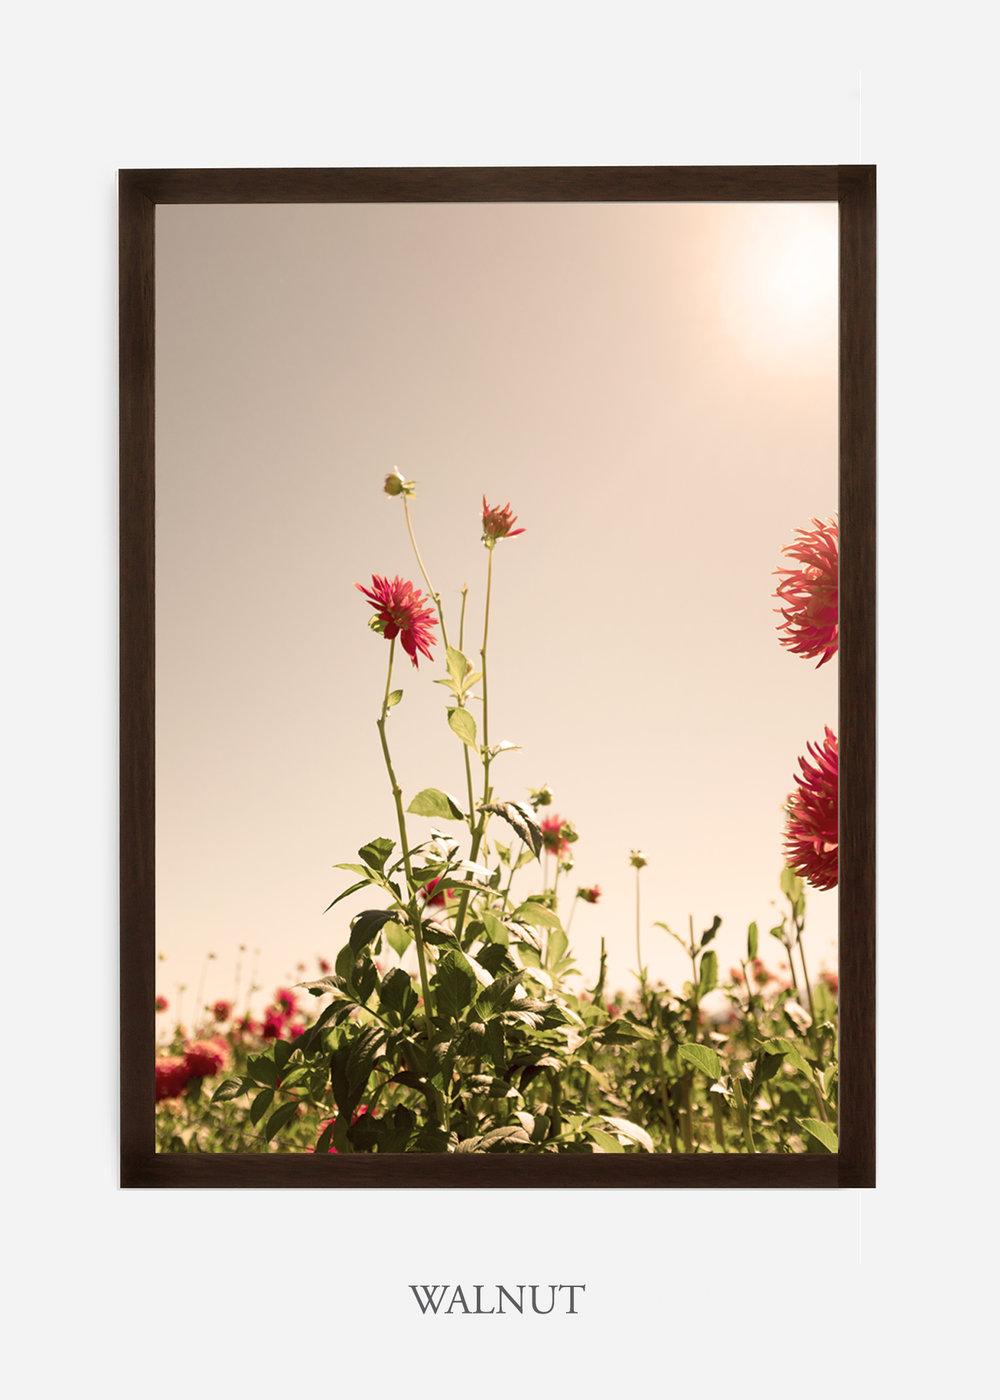 DahliaNo.2_walnutframe__NoMat_interiordesign_botanicalprint_art.jpg